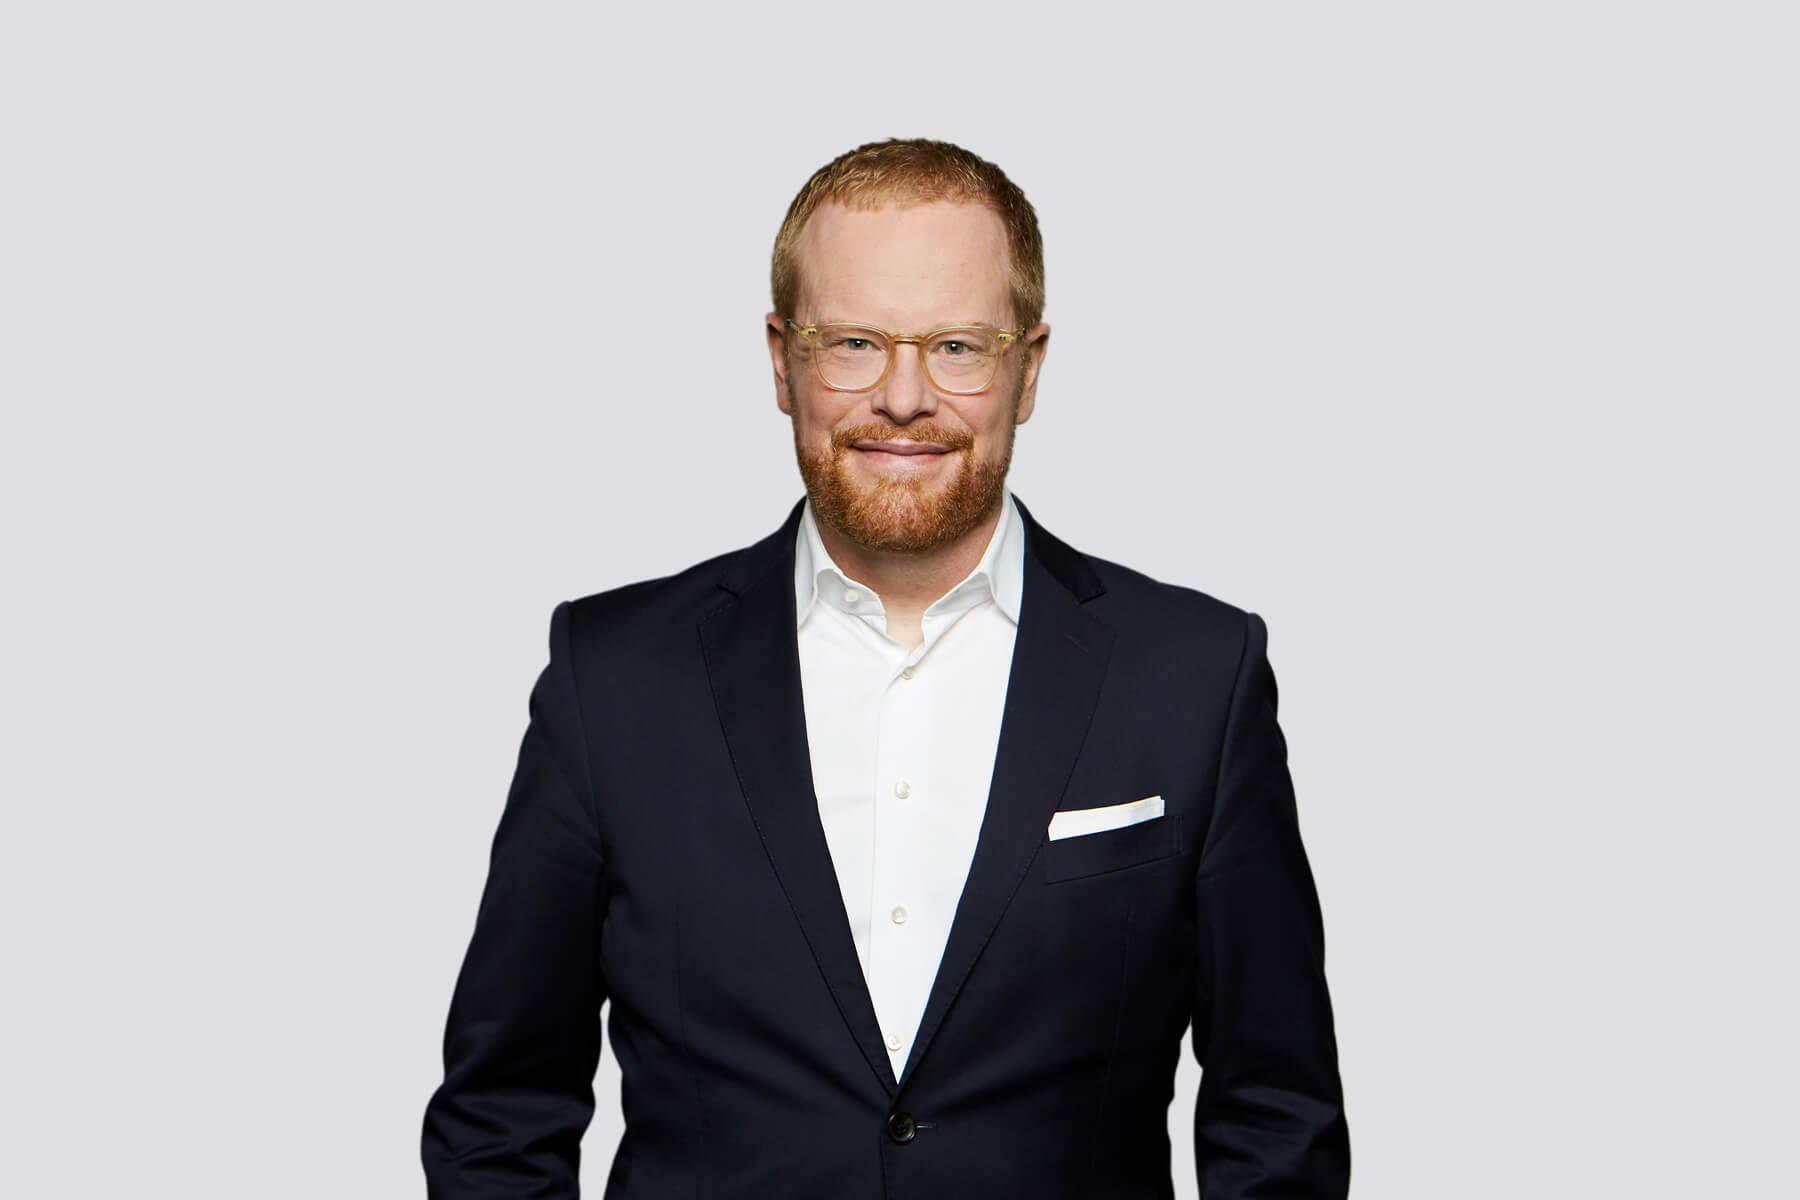 Stefan Kirsten - Head of Germany & Nordics